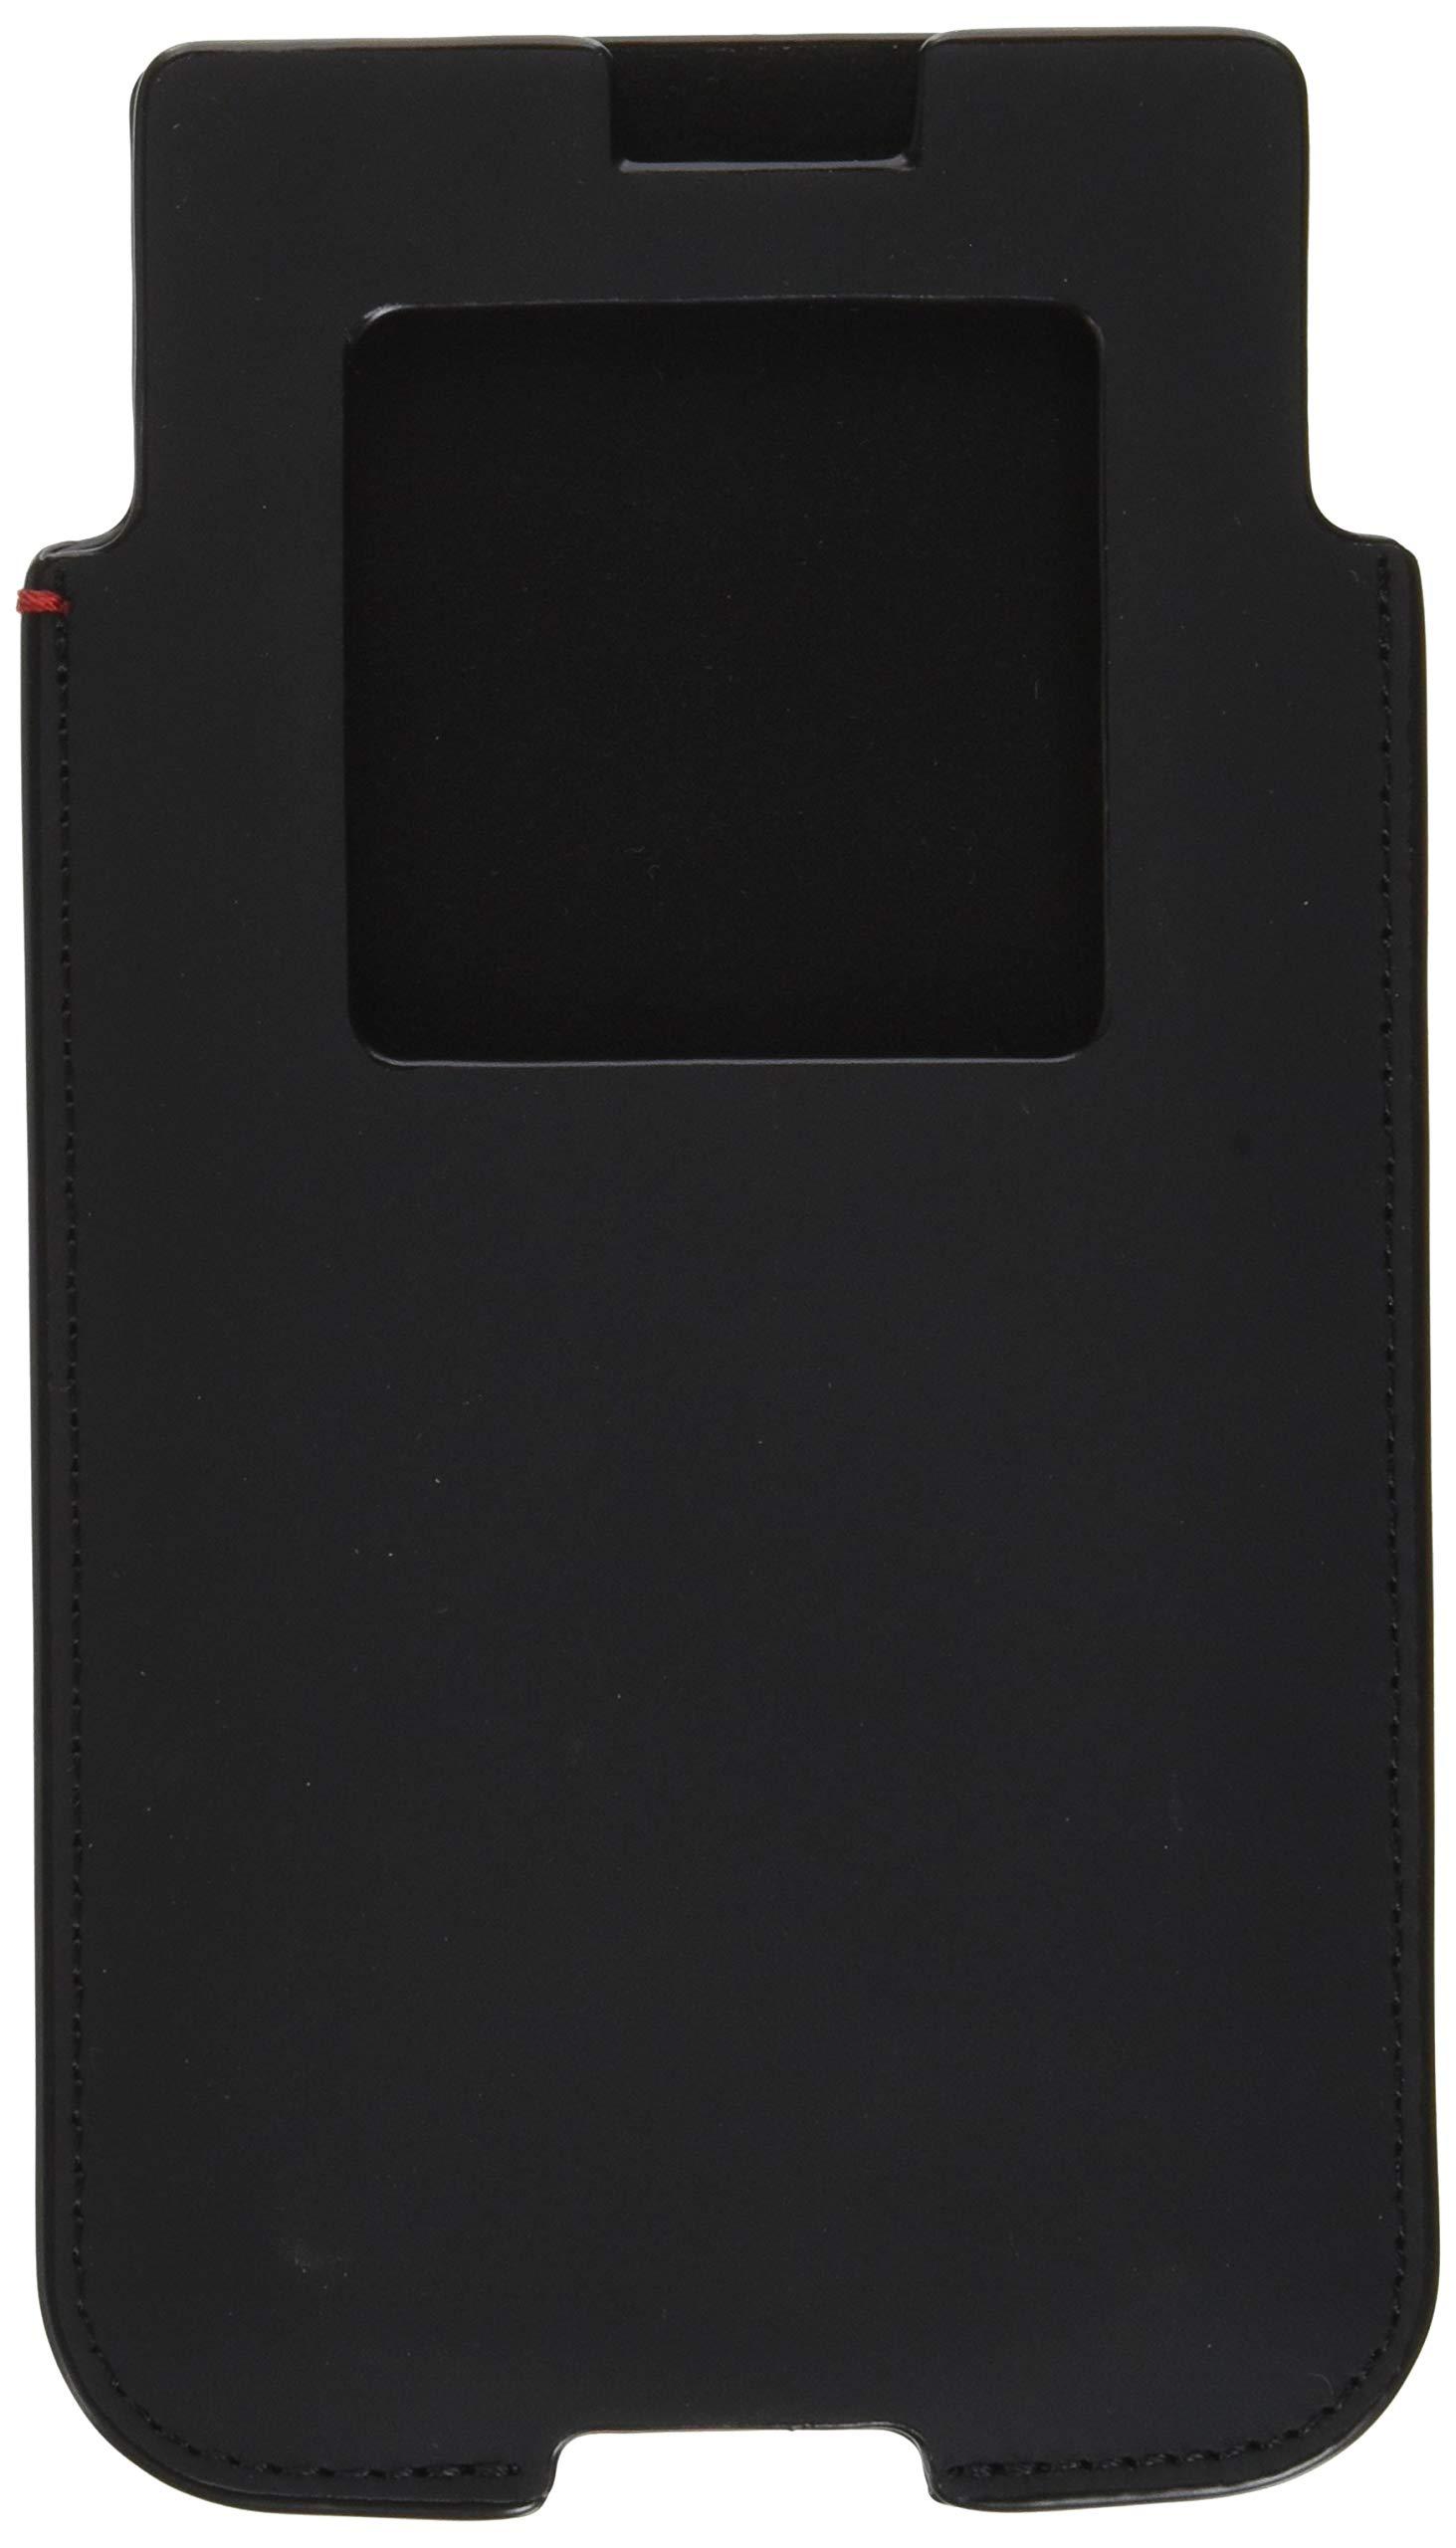 BlackBerry KEYone Smartphone Pocket Sleeve Case by BlackBerry